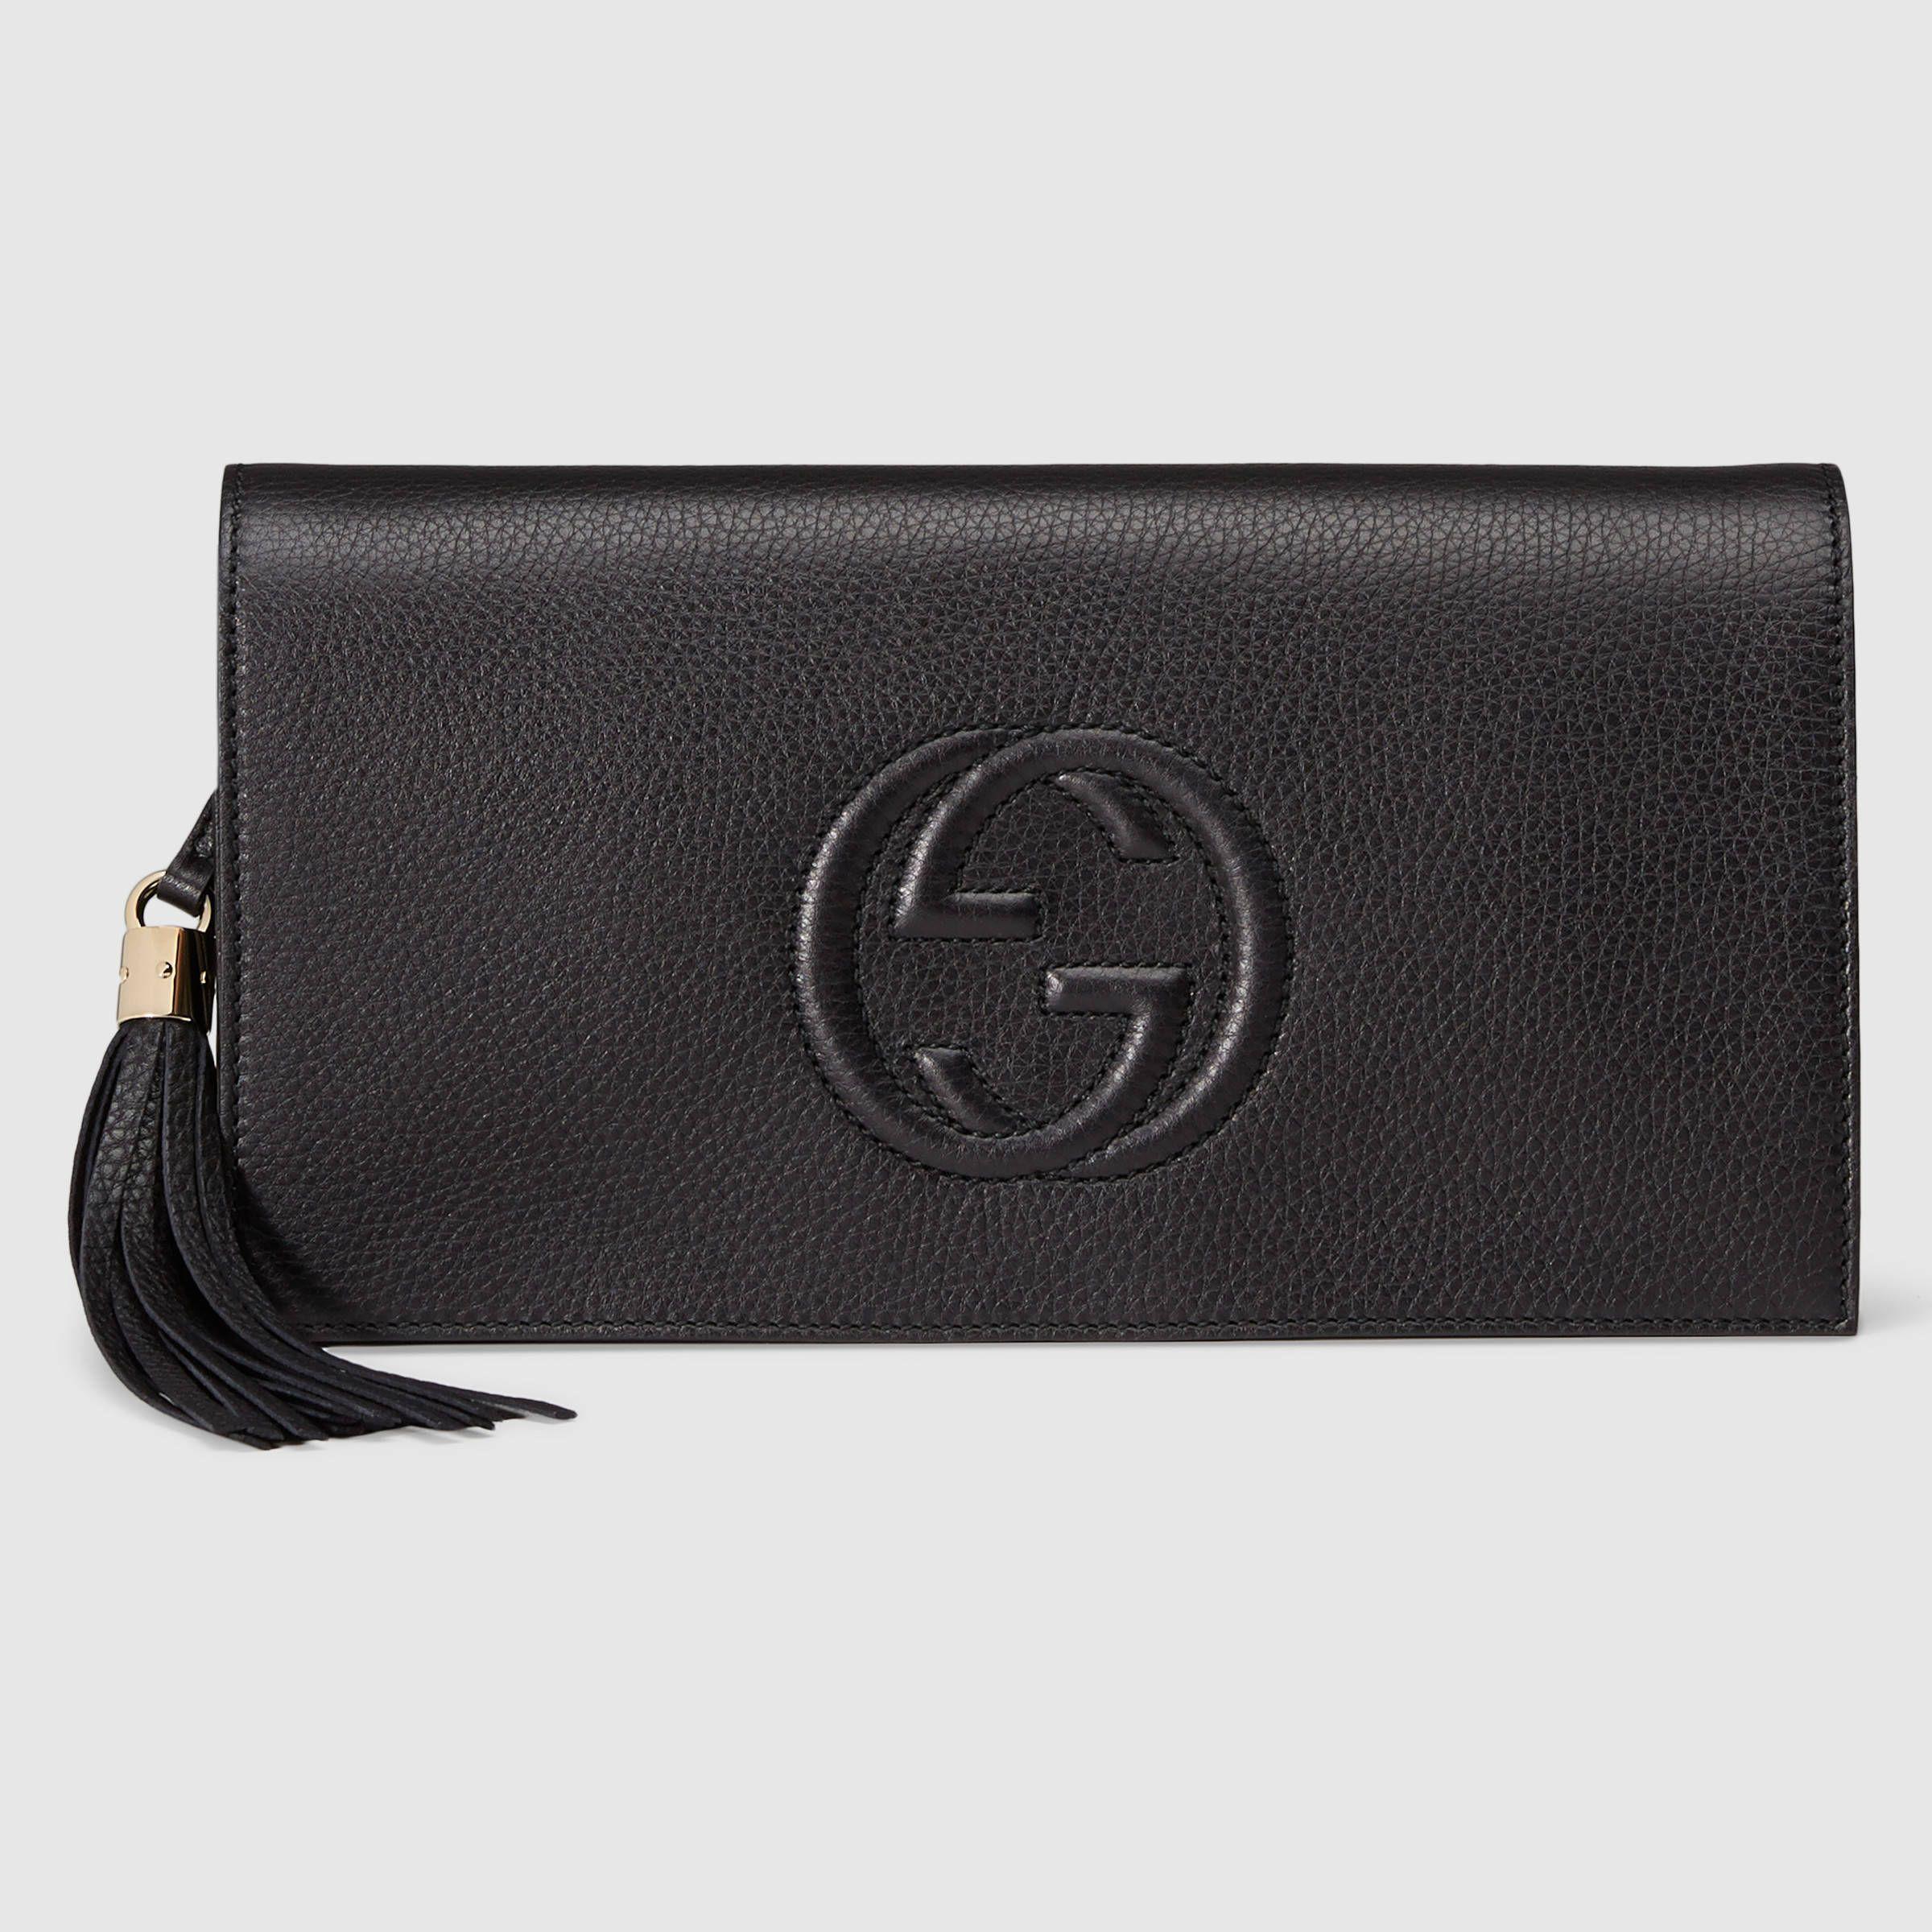 Gucci Women - Soho leather clutch - 336753A7M0G1000